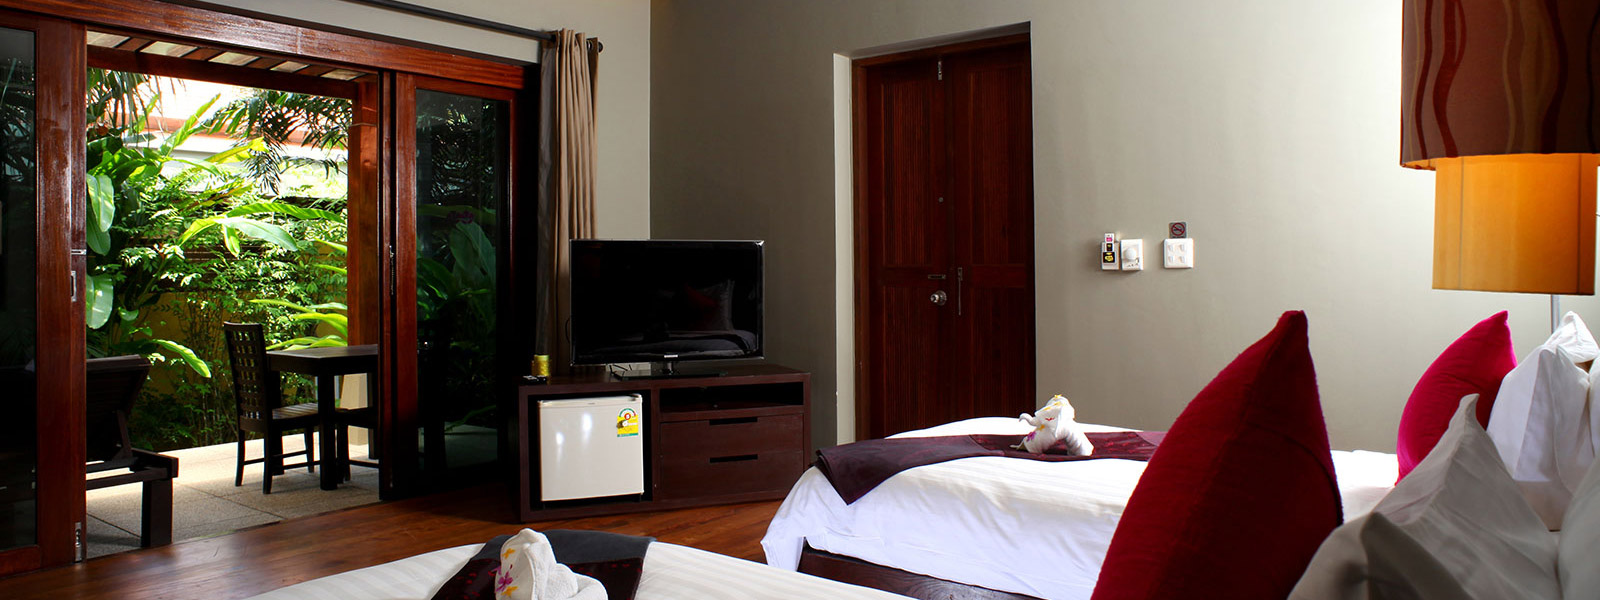 Chongfah Resort Khao Lak - Deluxe Bungalow